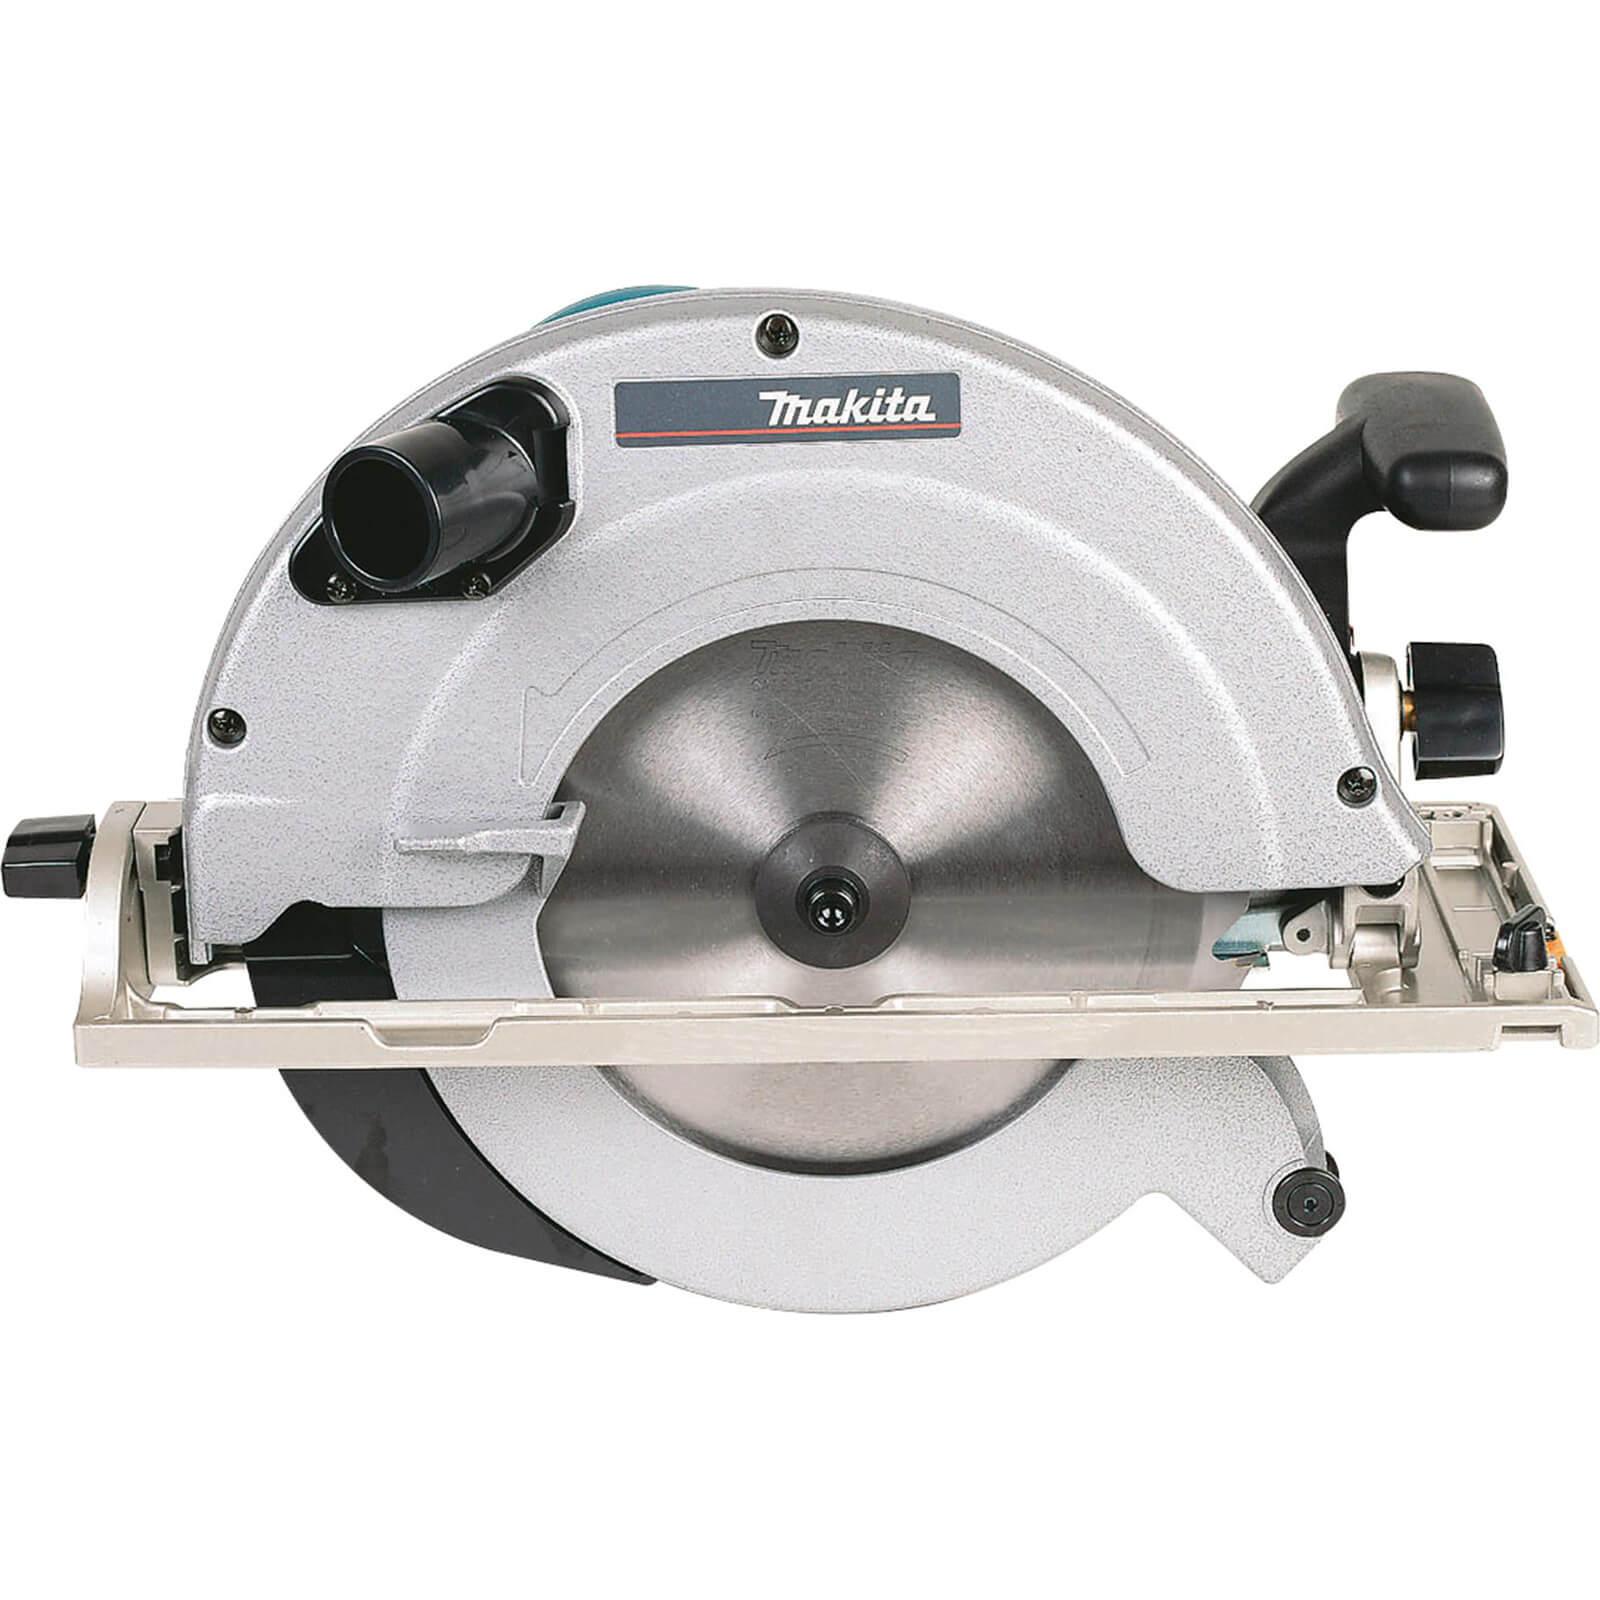 Makita 5903R/1 -235MM Circular Saw - 110V